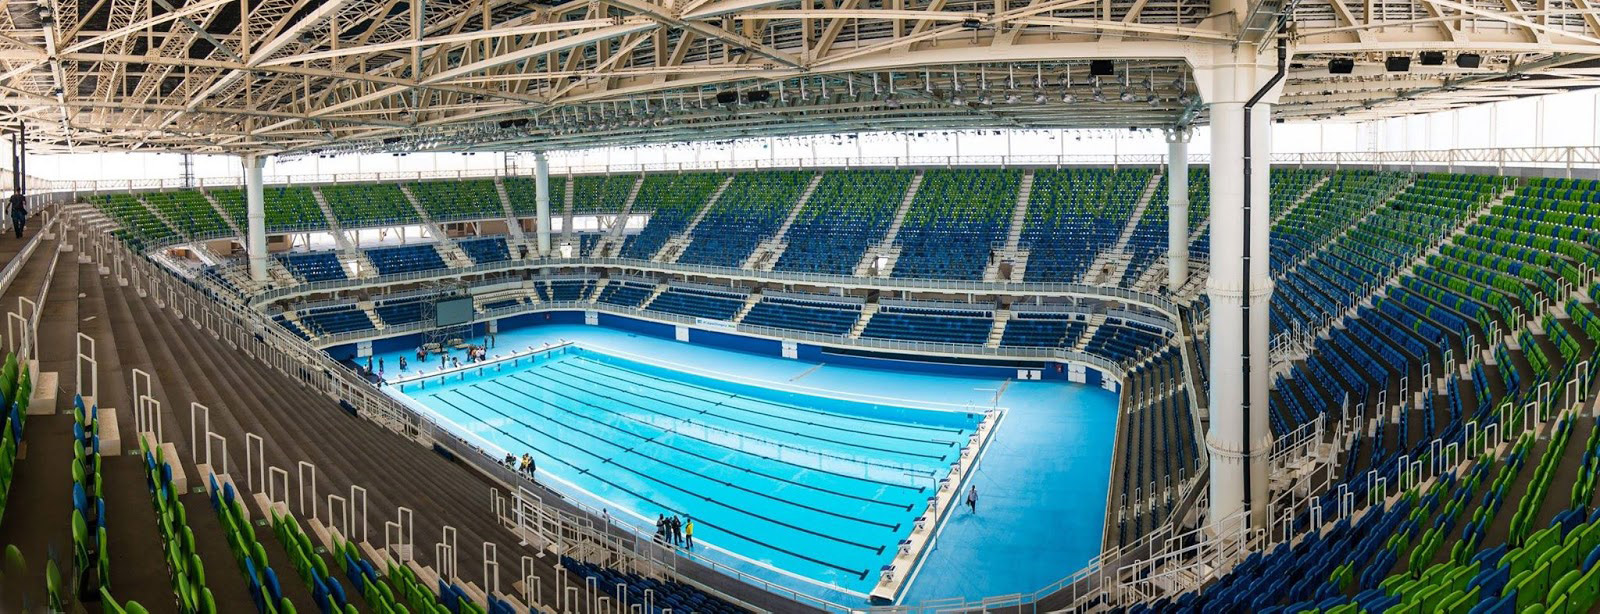 vareajao - Olympic Swimming Pool 2016